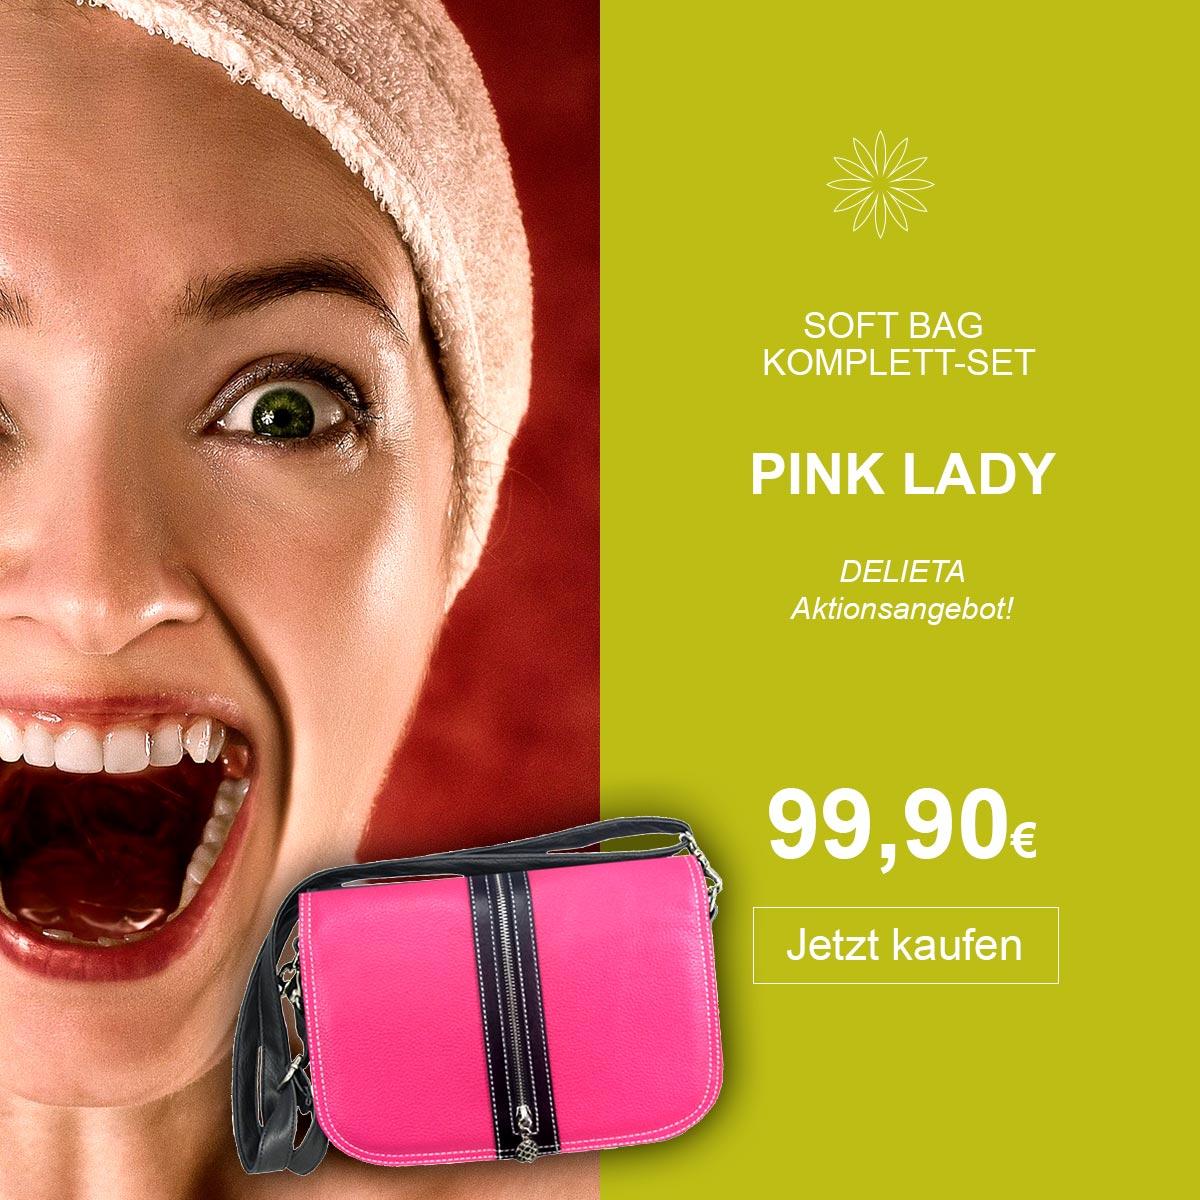 Pink Lady Komplett Set